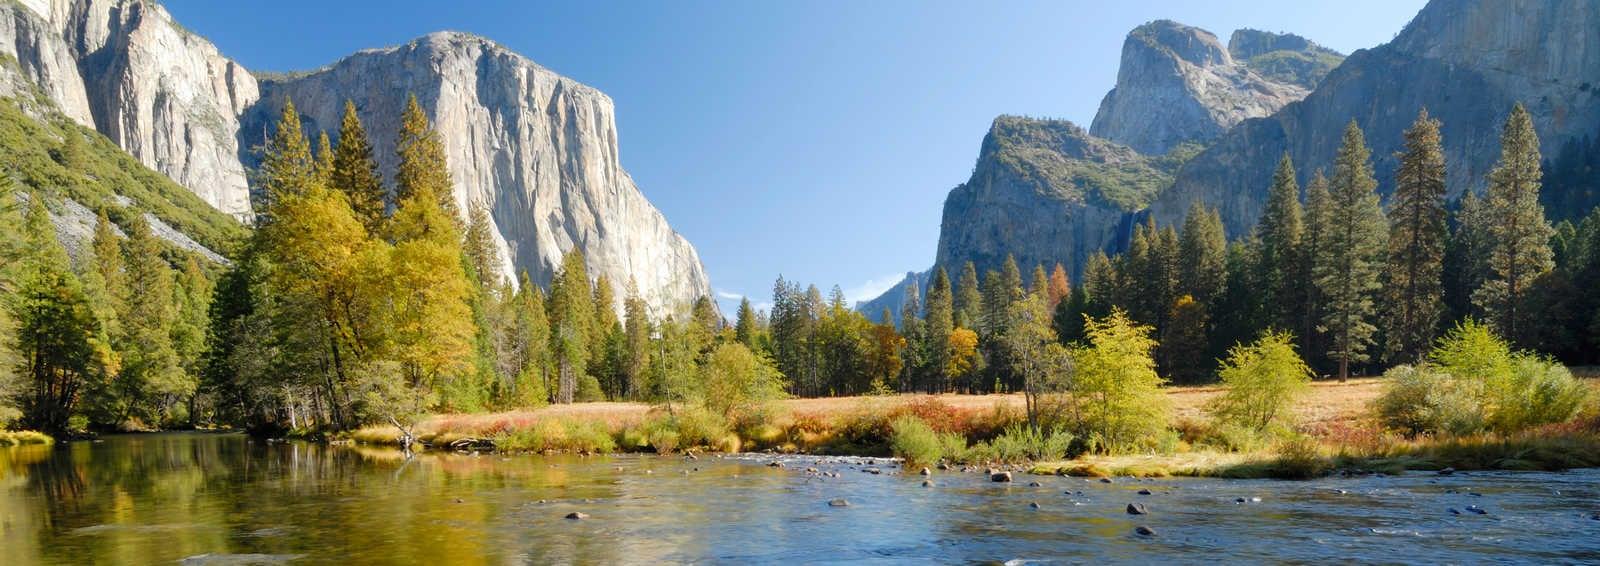 Autumn in Yosemite Valley, USA